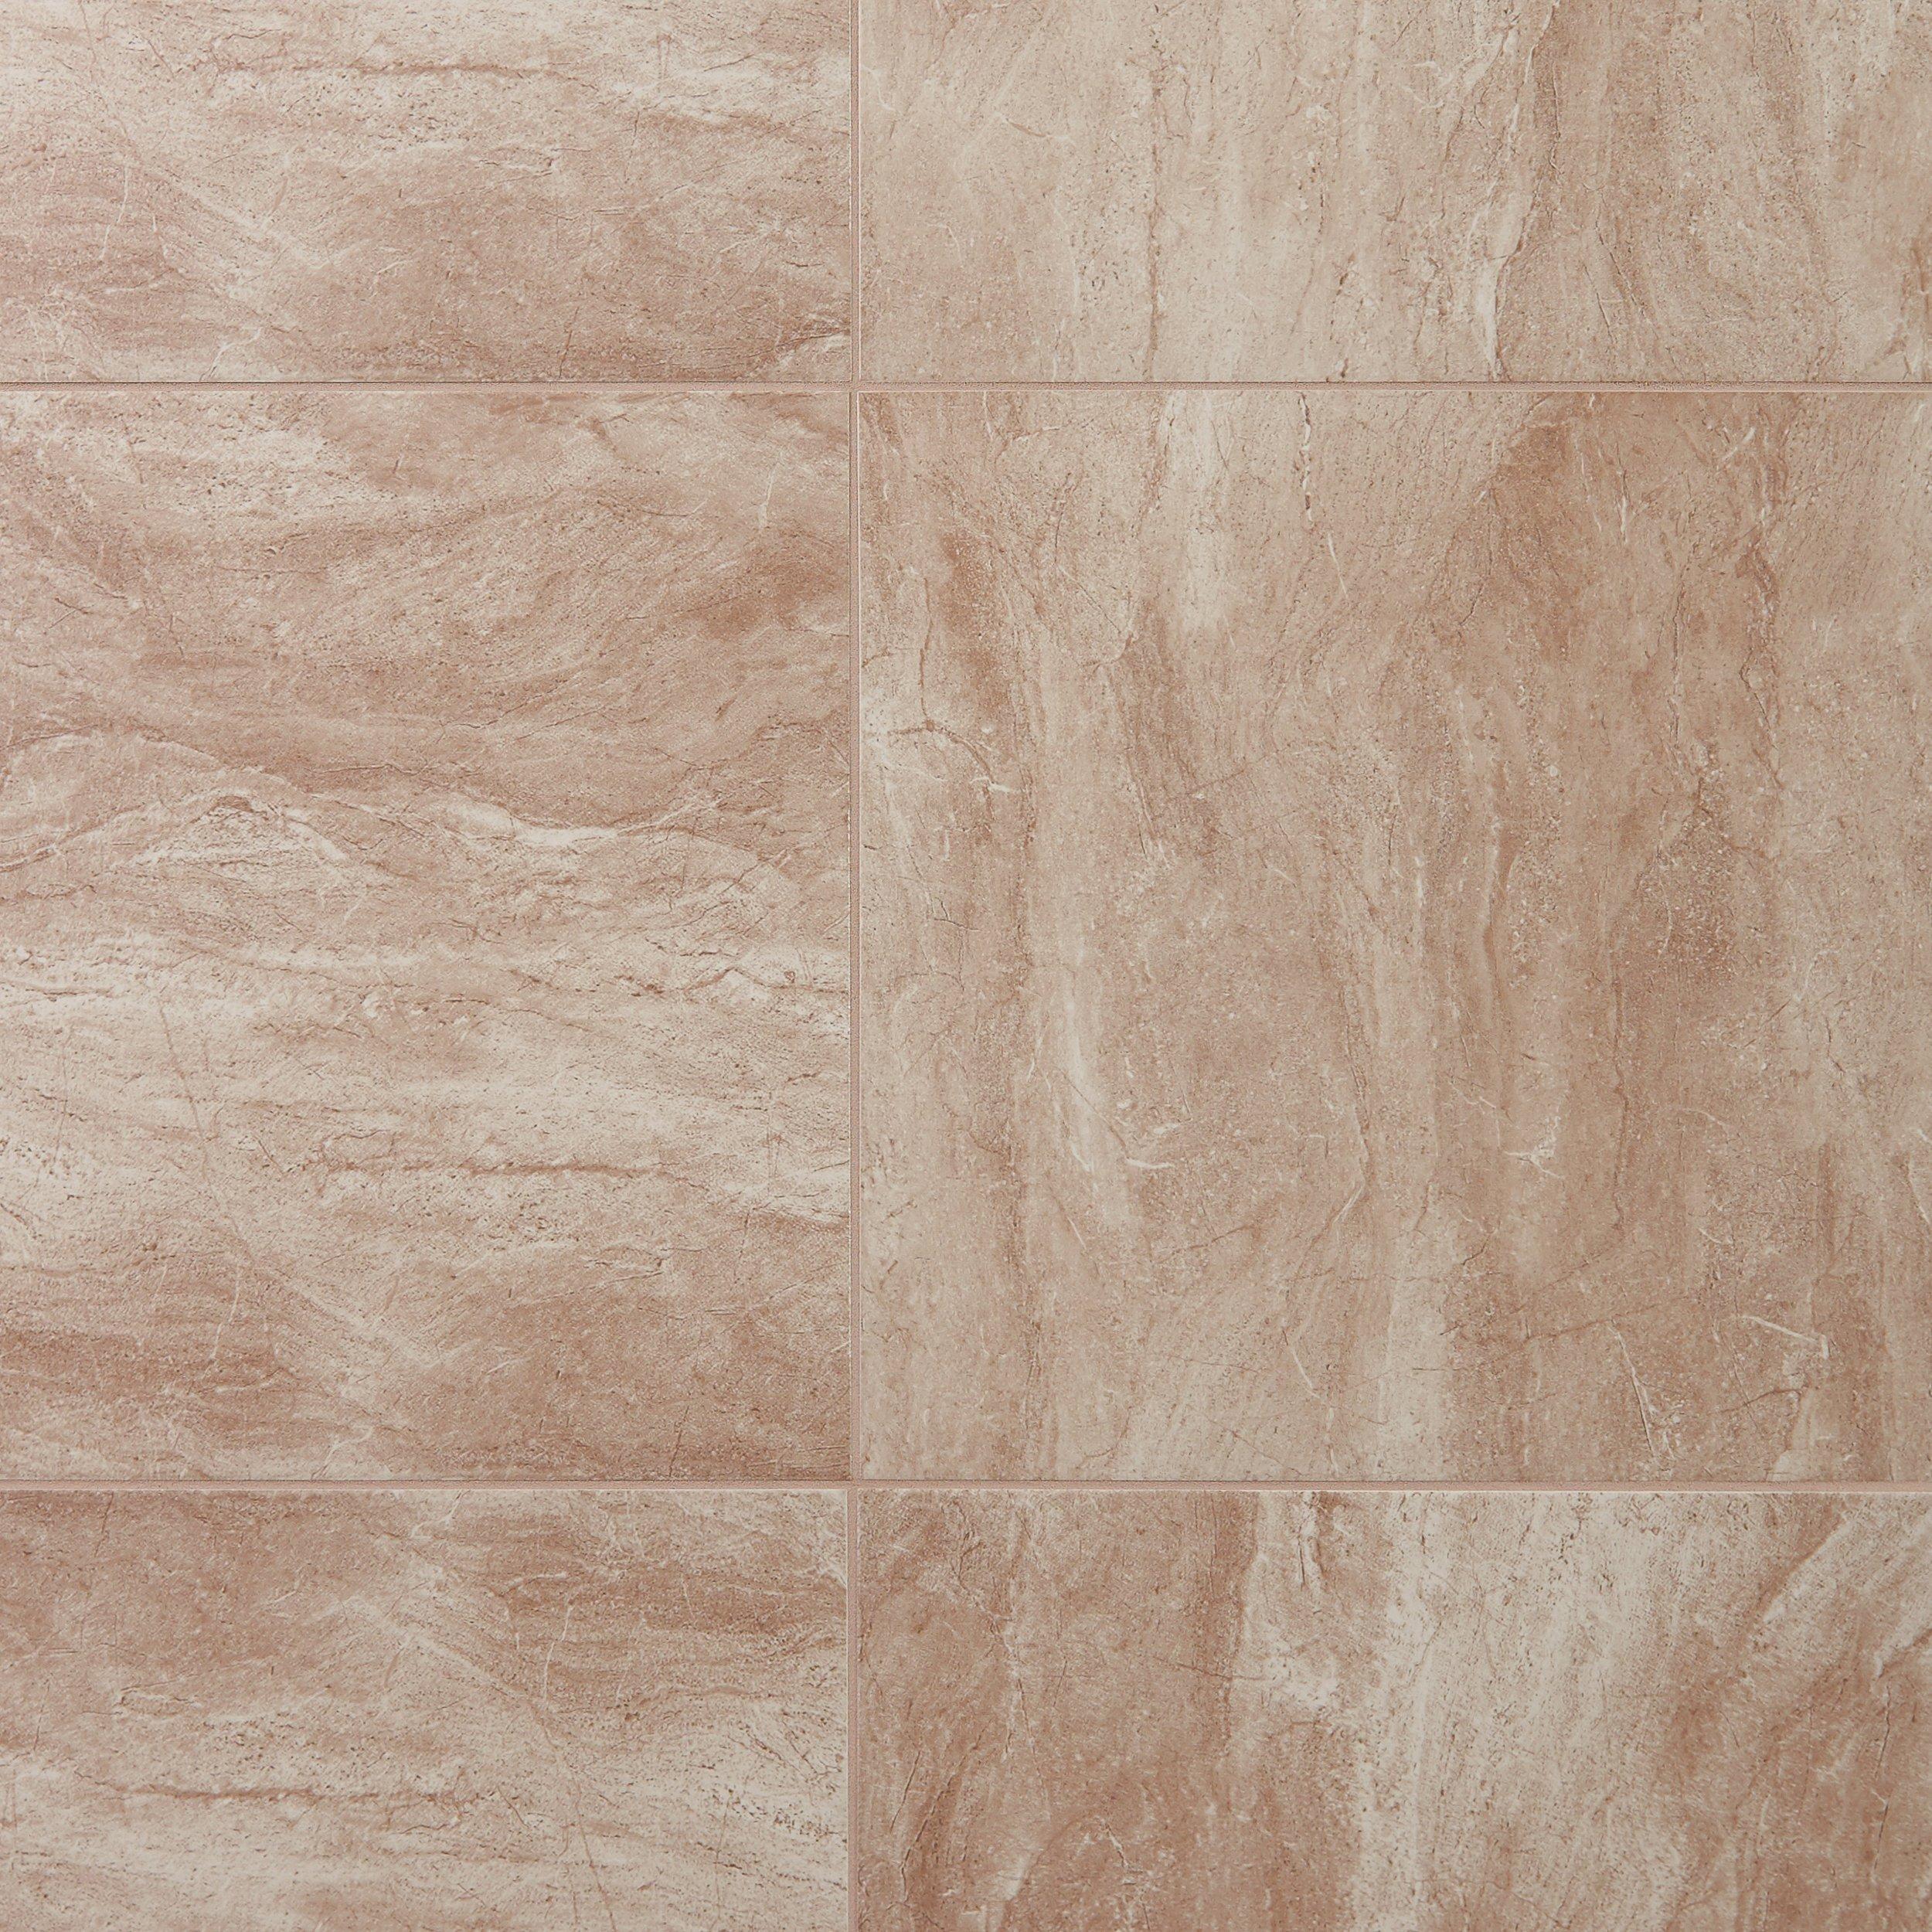 Costa bella beige porcelain tile 20 x 20 912102636 floor and decor dailygadgetfo Gallery